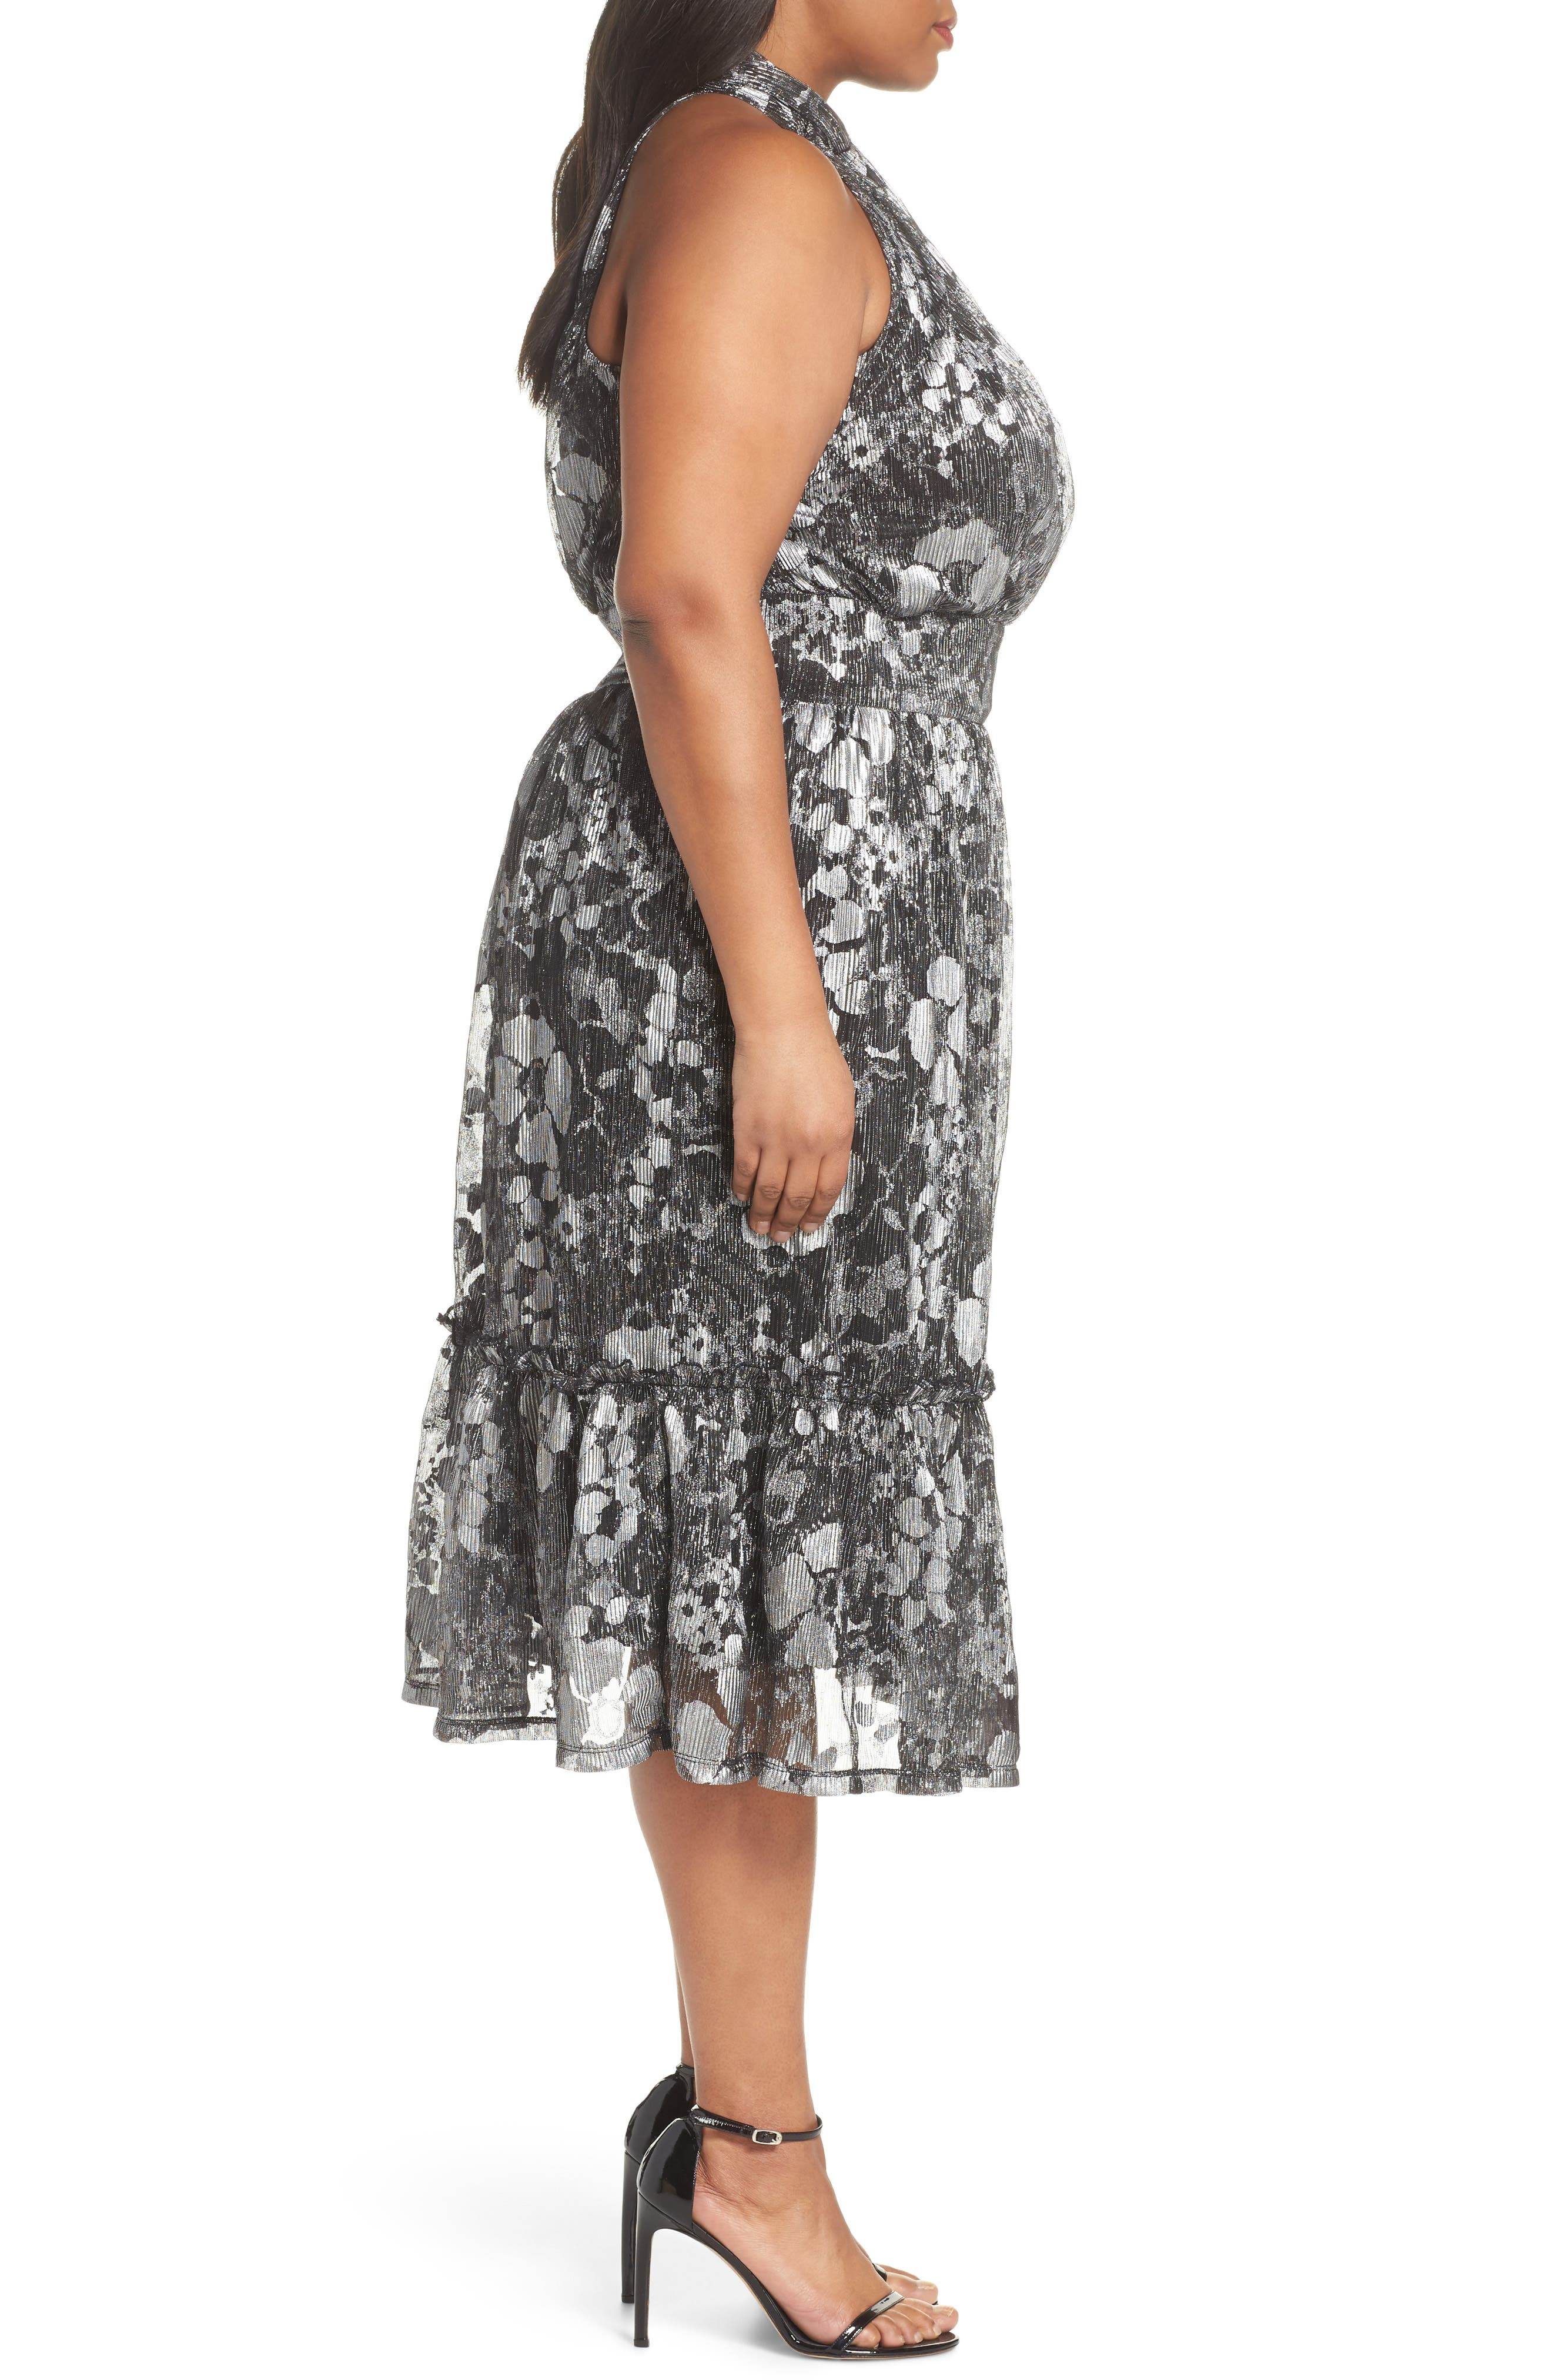 Floral Metallic Midi Dress,                             Alternate thumbnail 3, color,                             Black/ Silver Foil